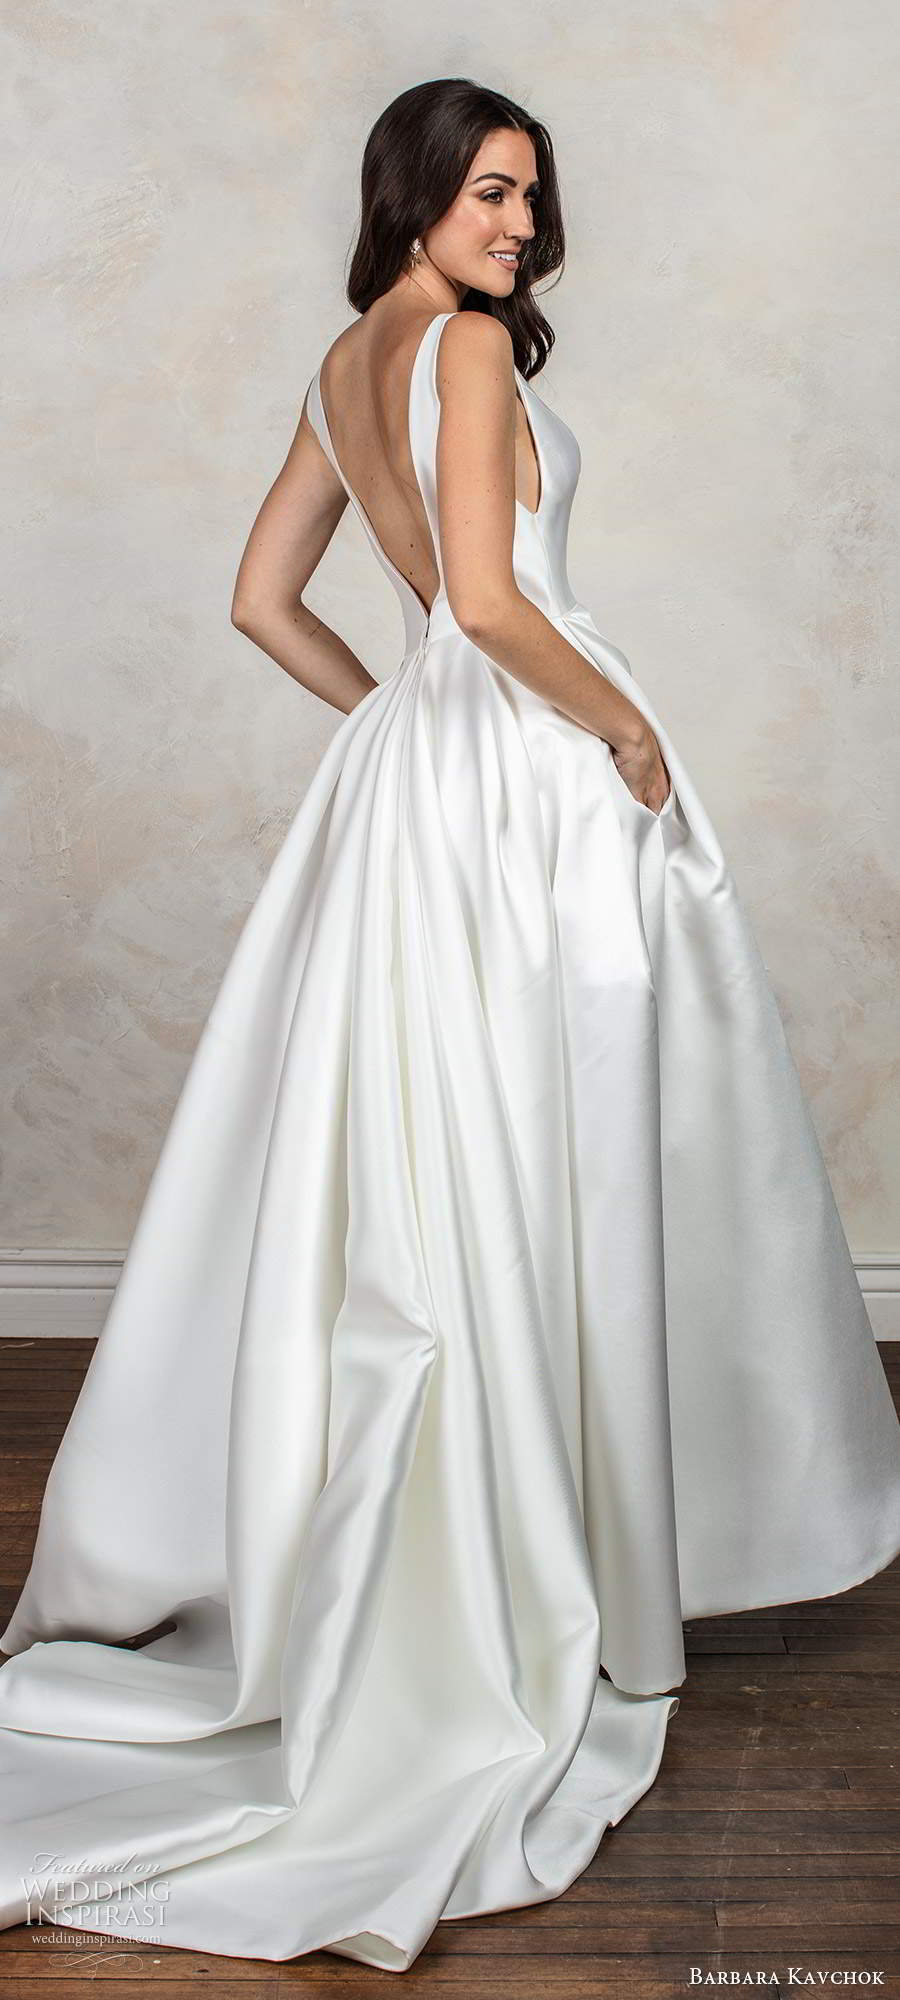 barbara kavchok fall 2020 bridal sleeveless thick straps plunging v neckline clean minimally embellished a line ball gown wedding dress pockets chapel train (8) mv